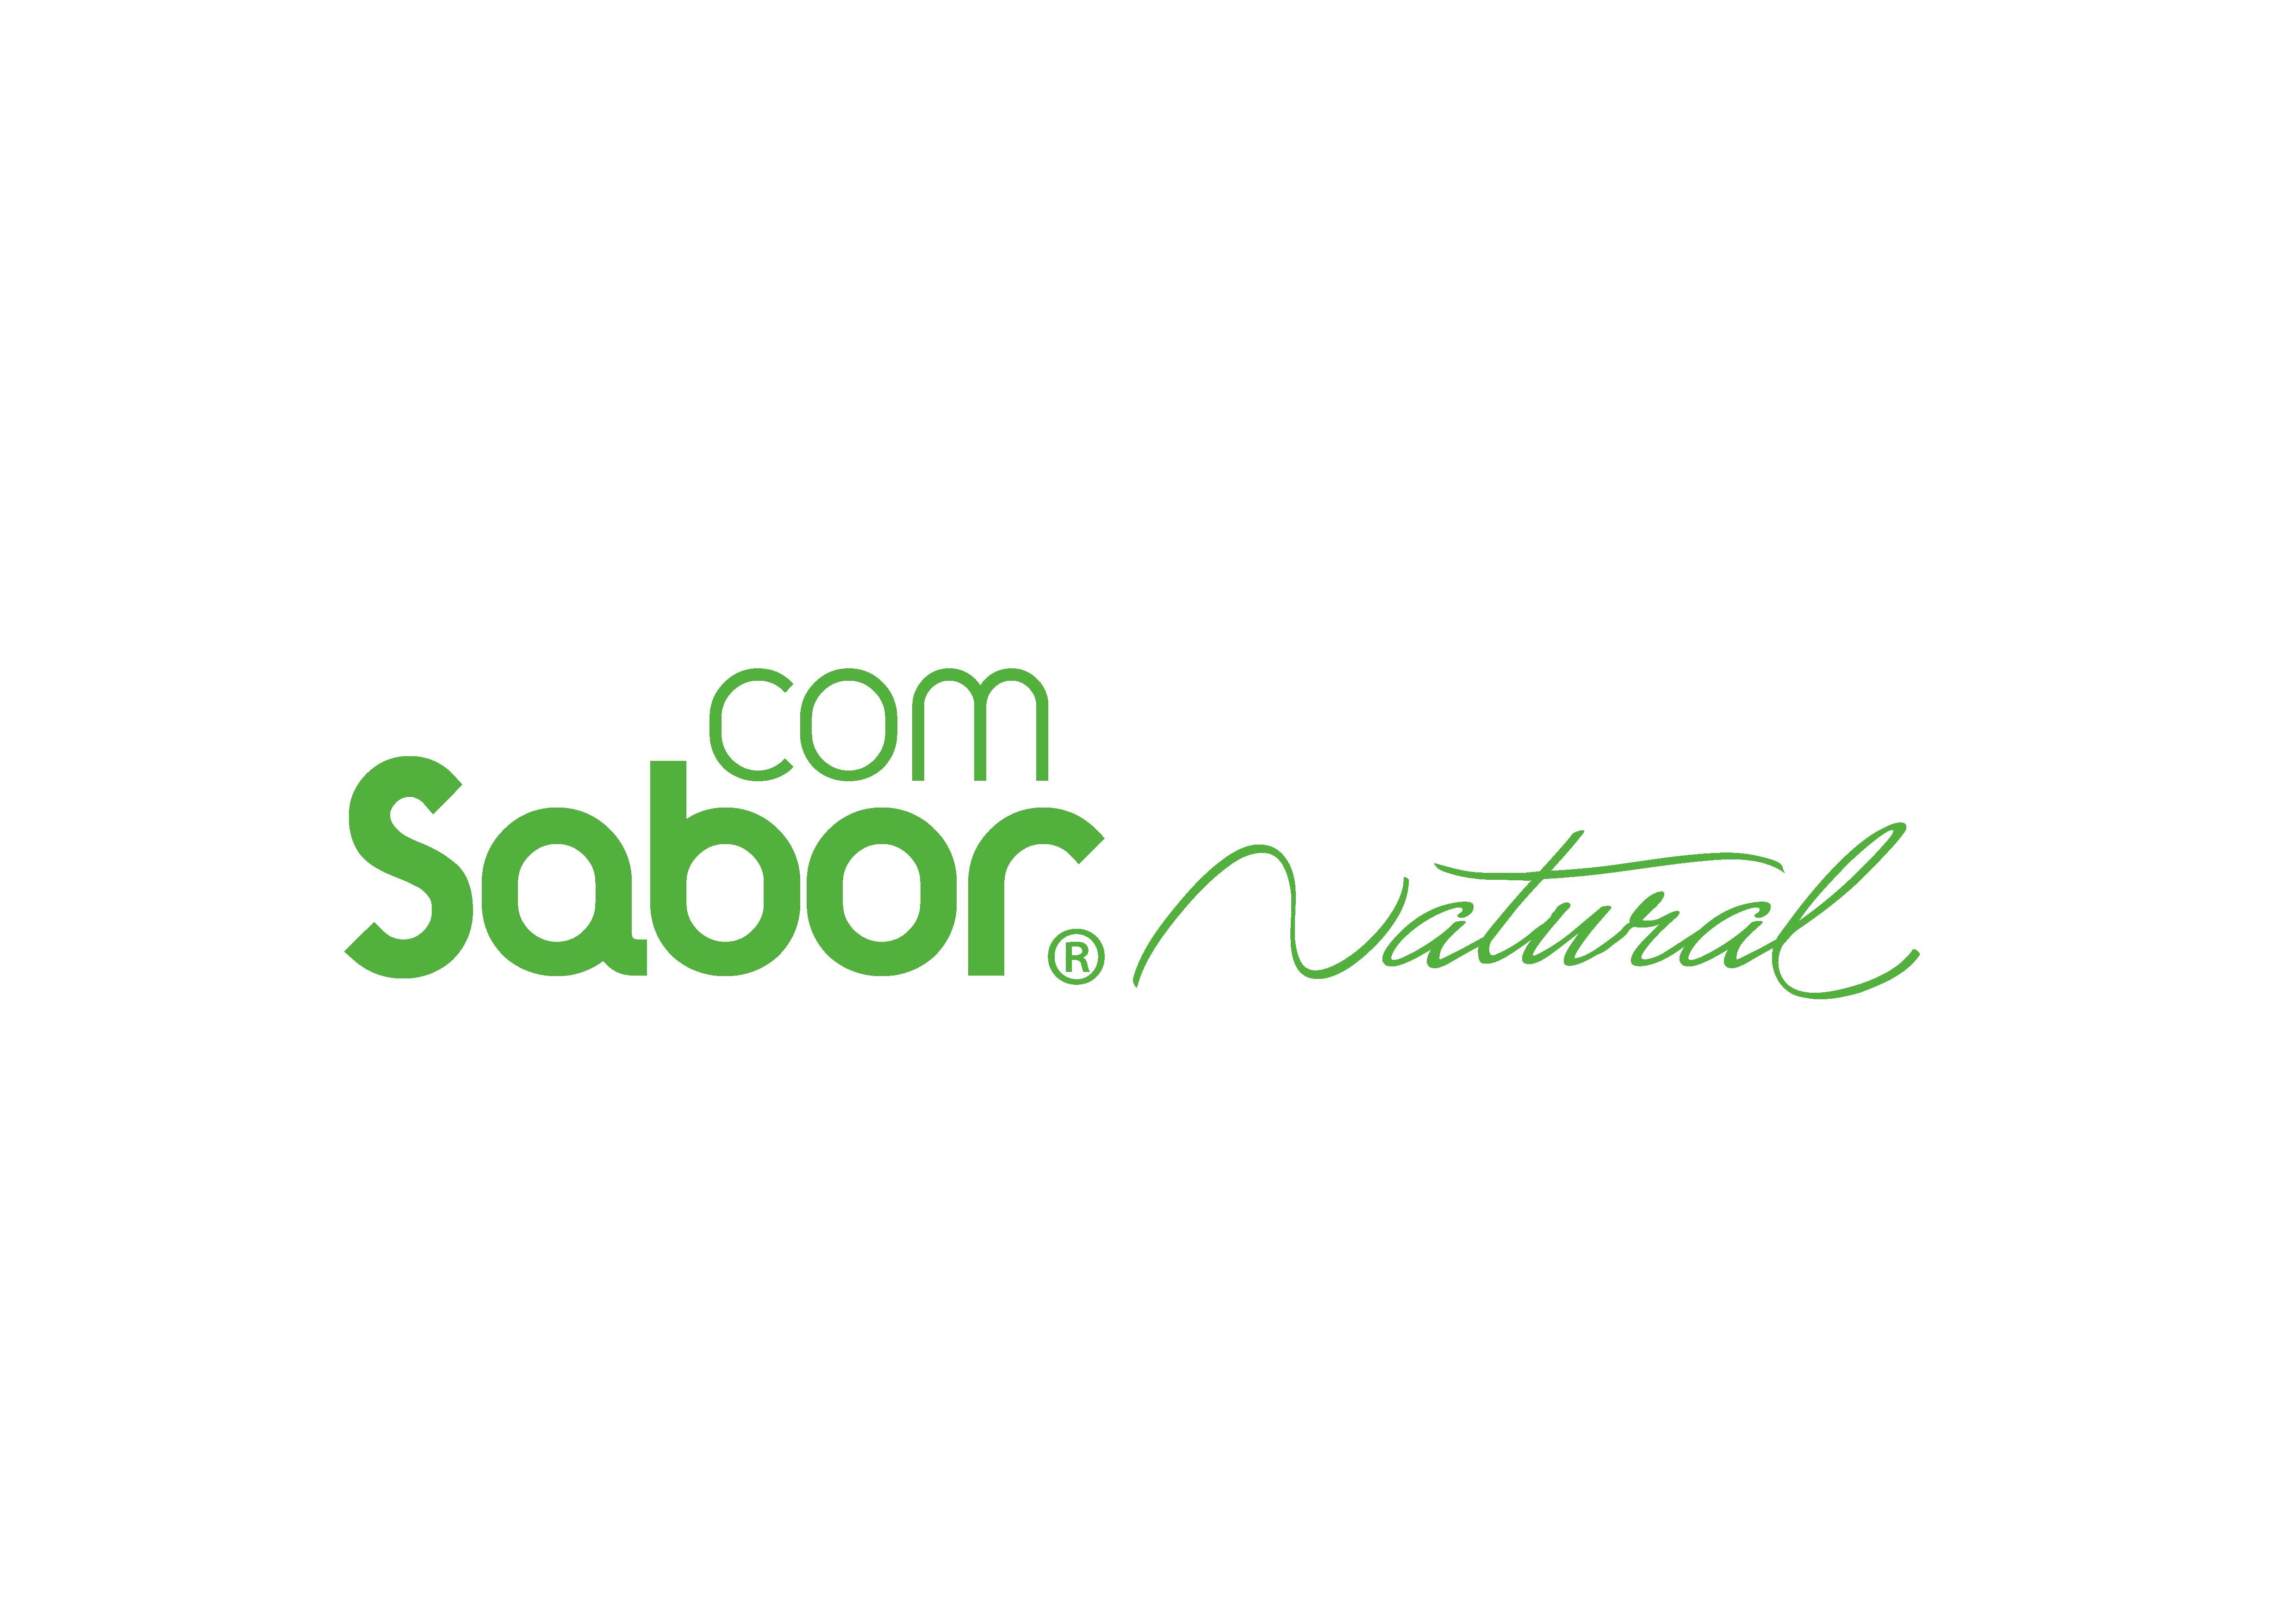 Com Sabor Natural